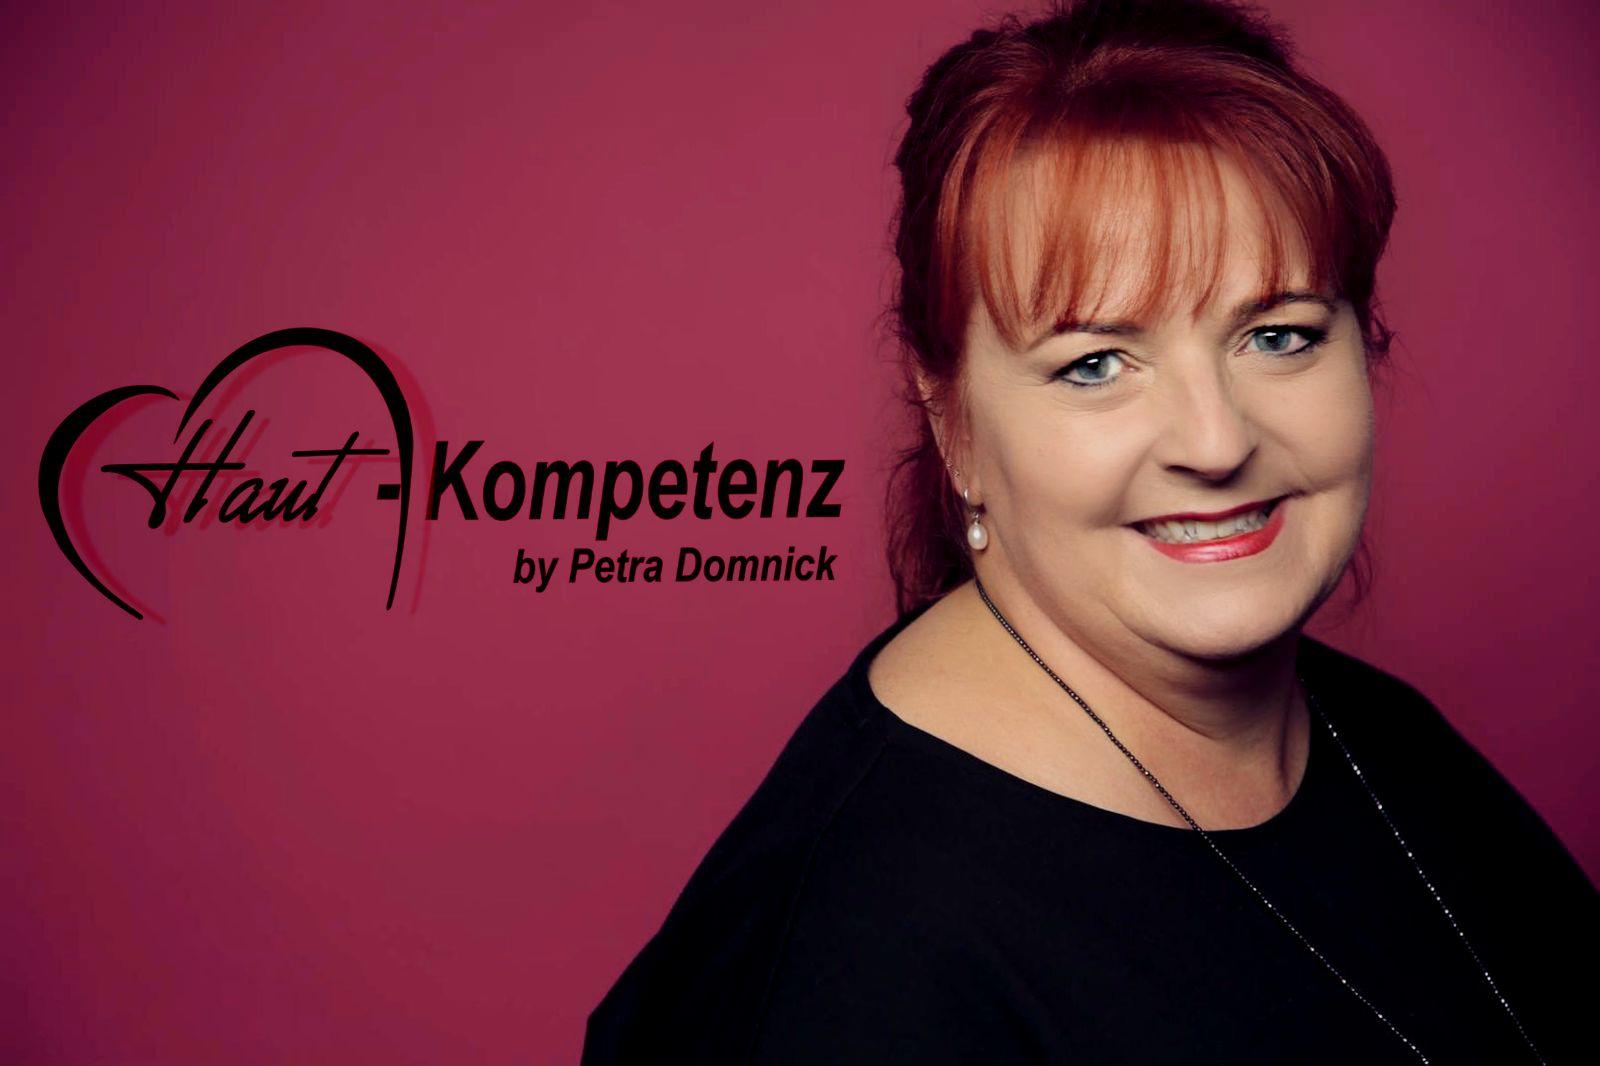 Haut-Kompetenz by Petra Domnick